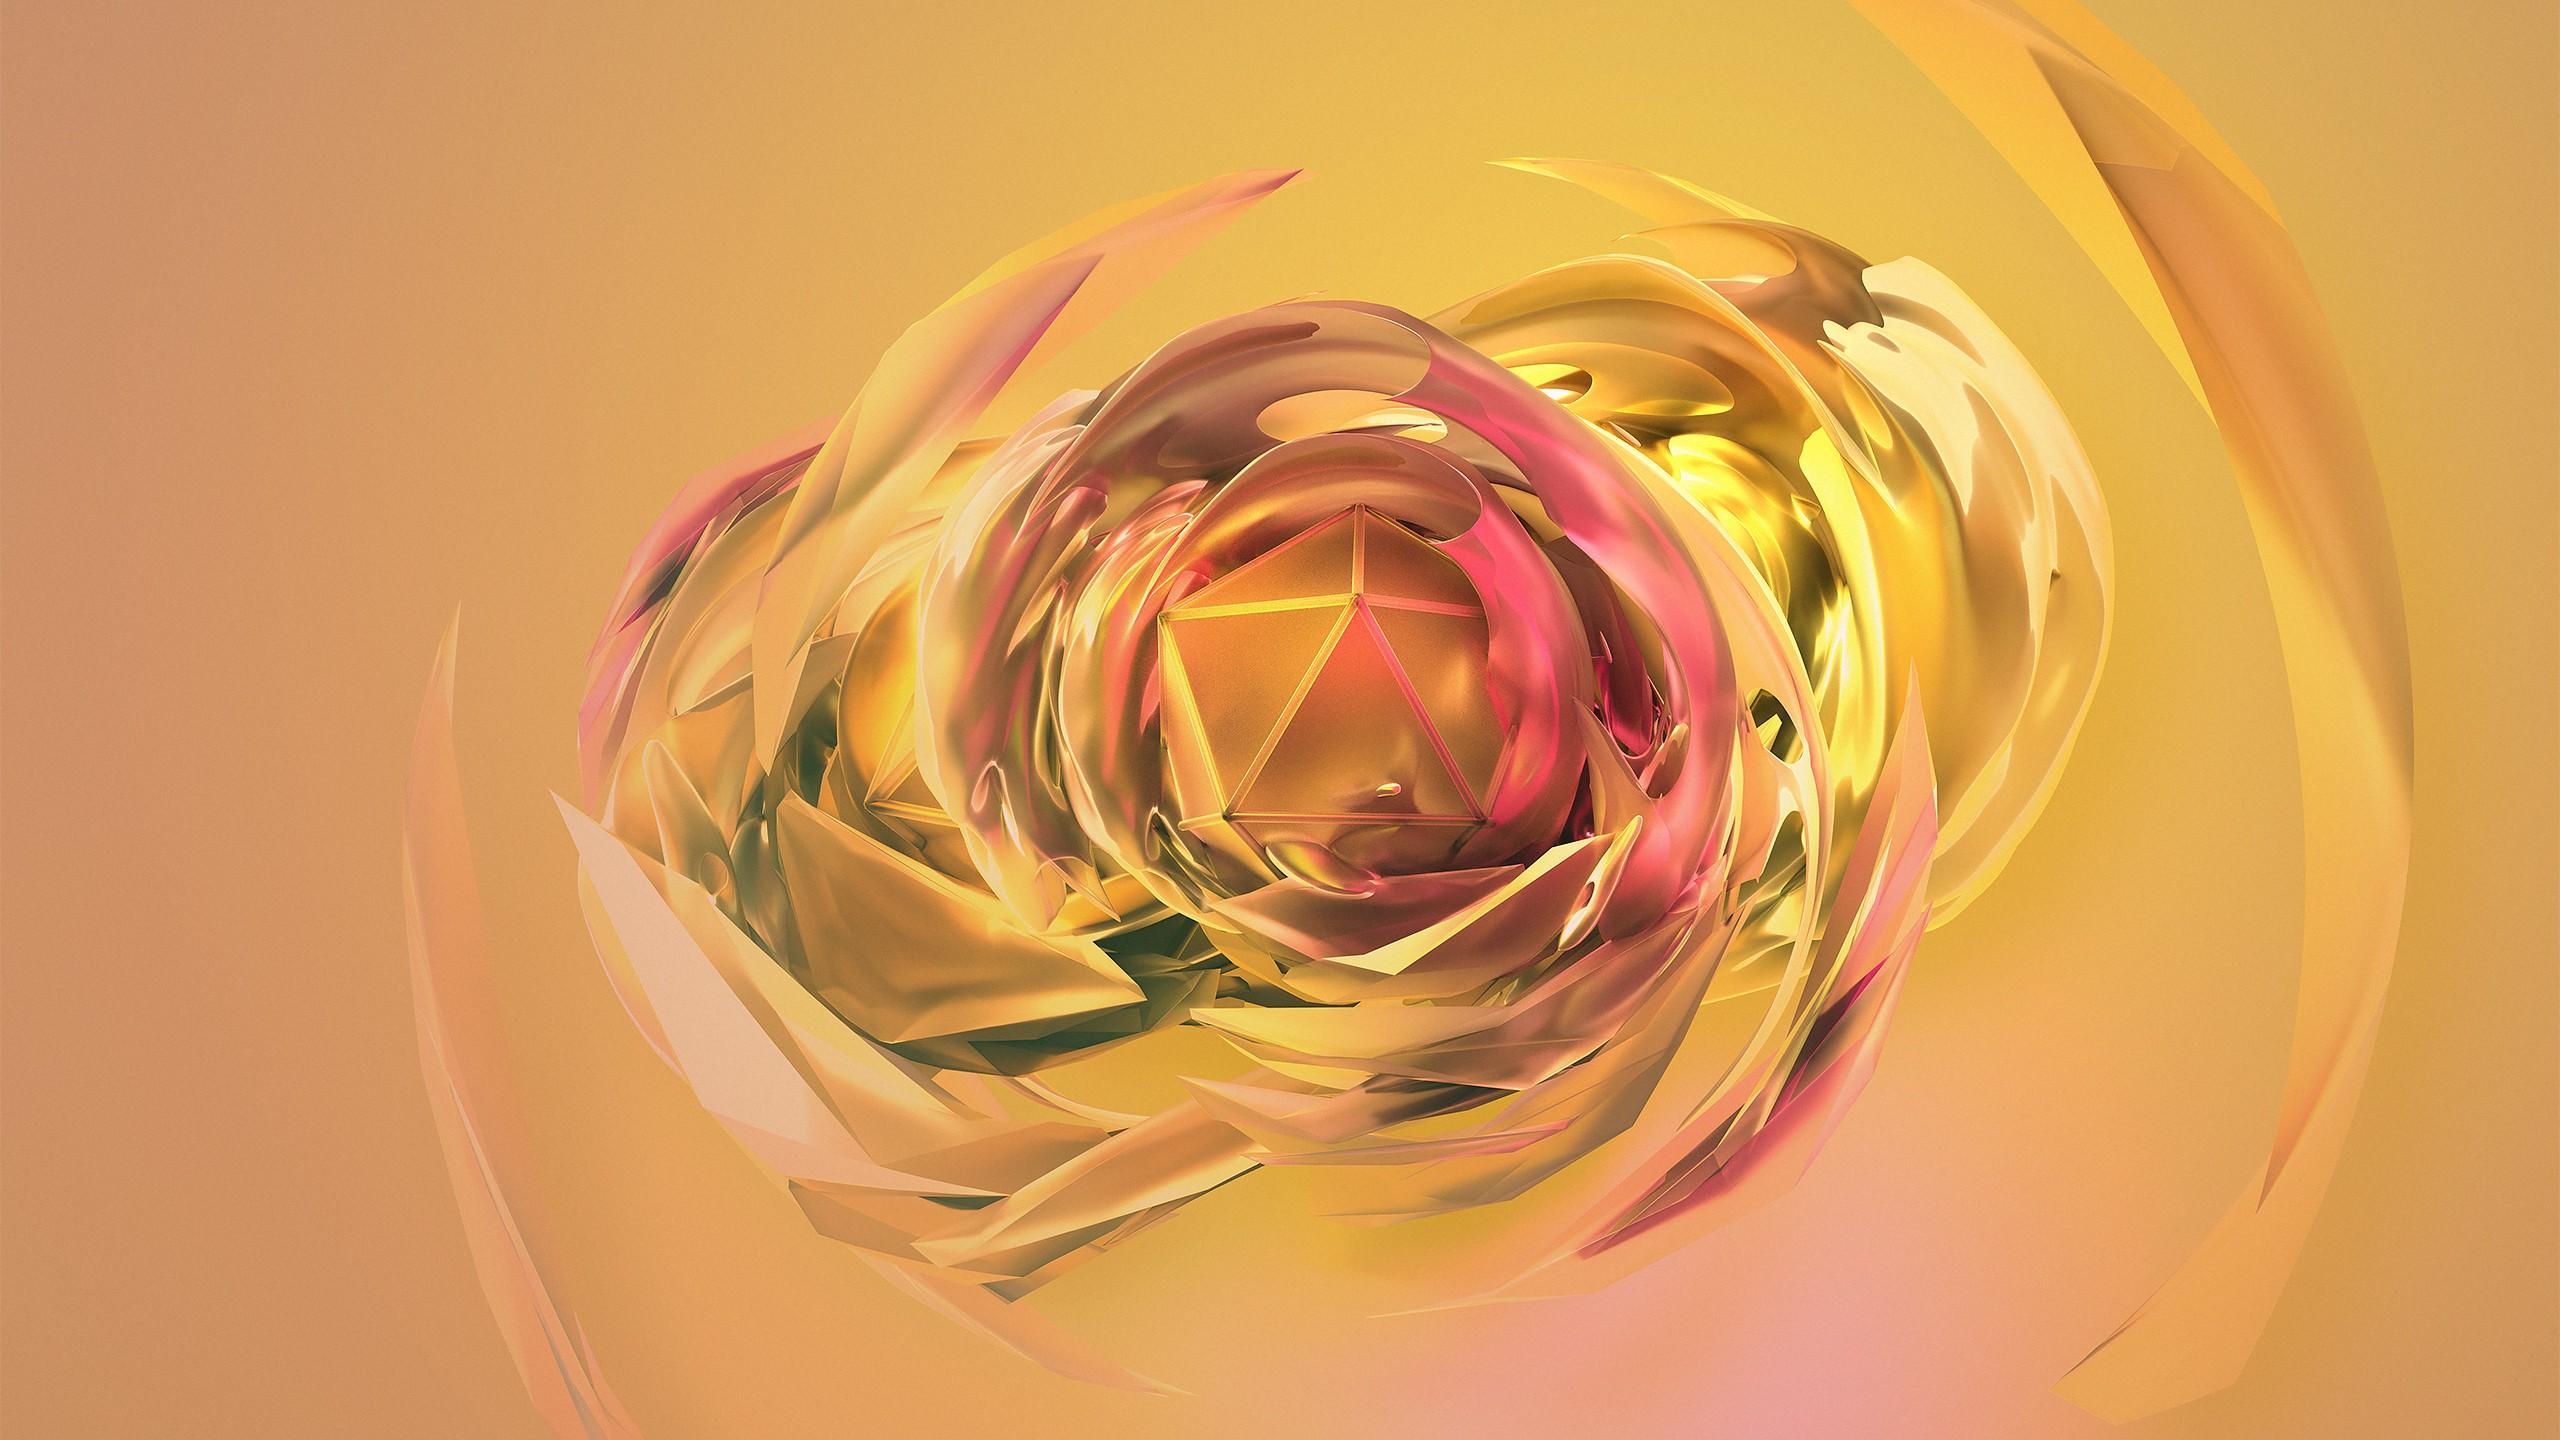 wallpaper banana dreams, 3d, sphere, green, hd, abstract #16379